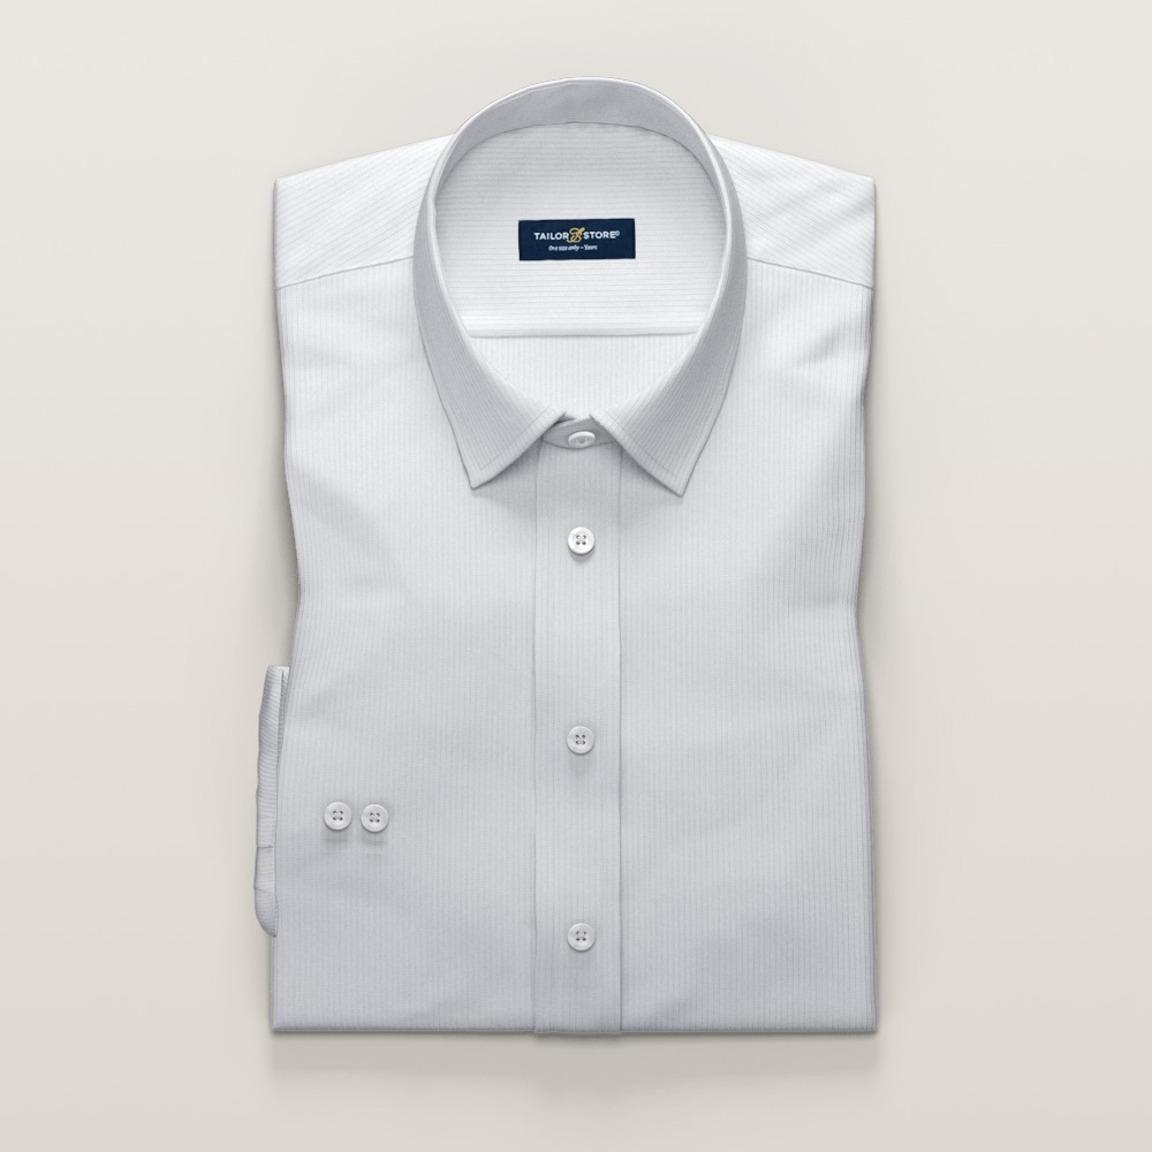 Damenhemd aus luxuriösem weißem Ratière-Gewebe